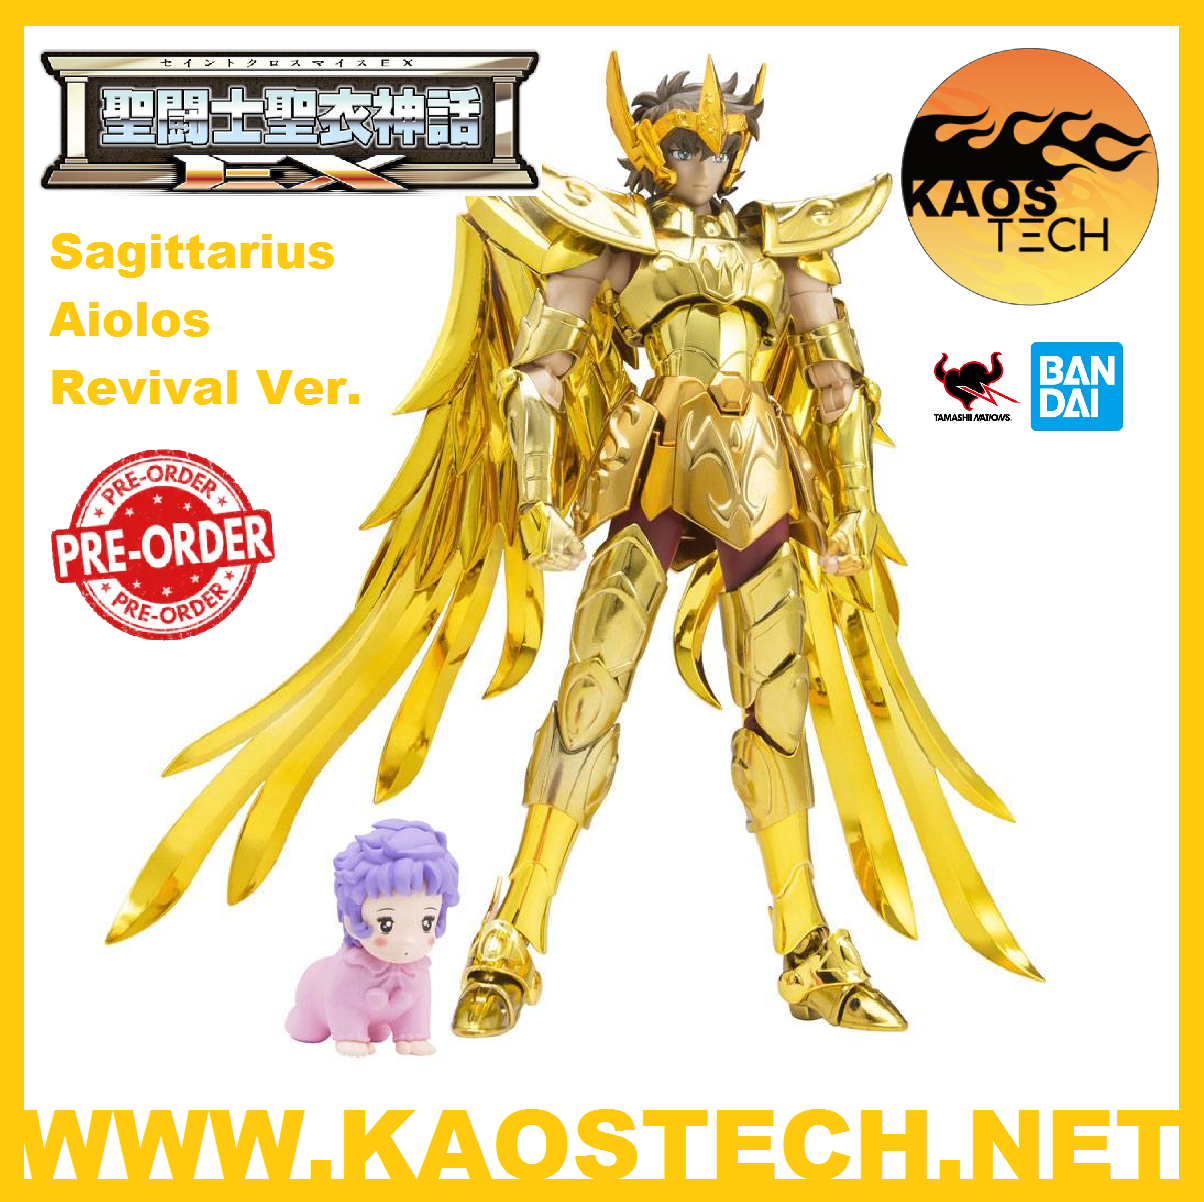 Saint Seiya Myth Cloth EX: Sagittarius Aiolos Revival Ver. by Bandai Tamashii